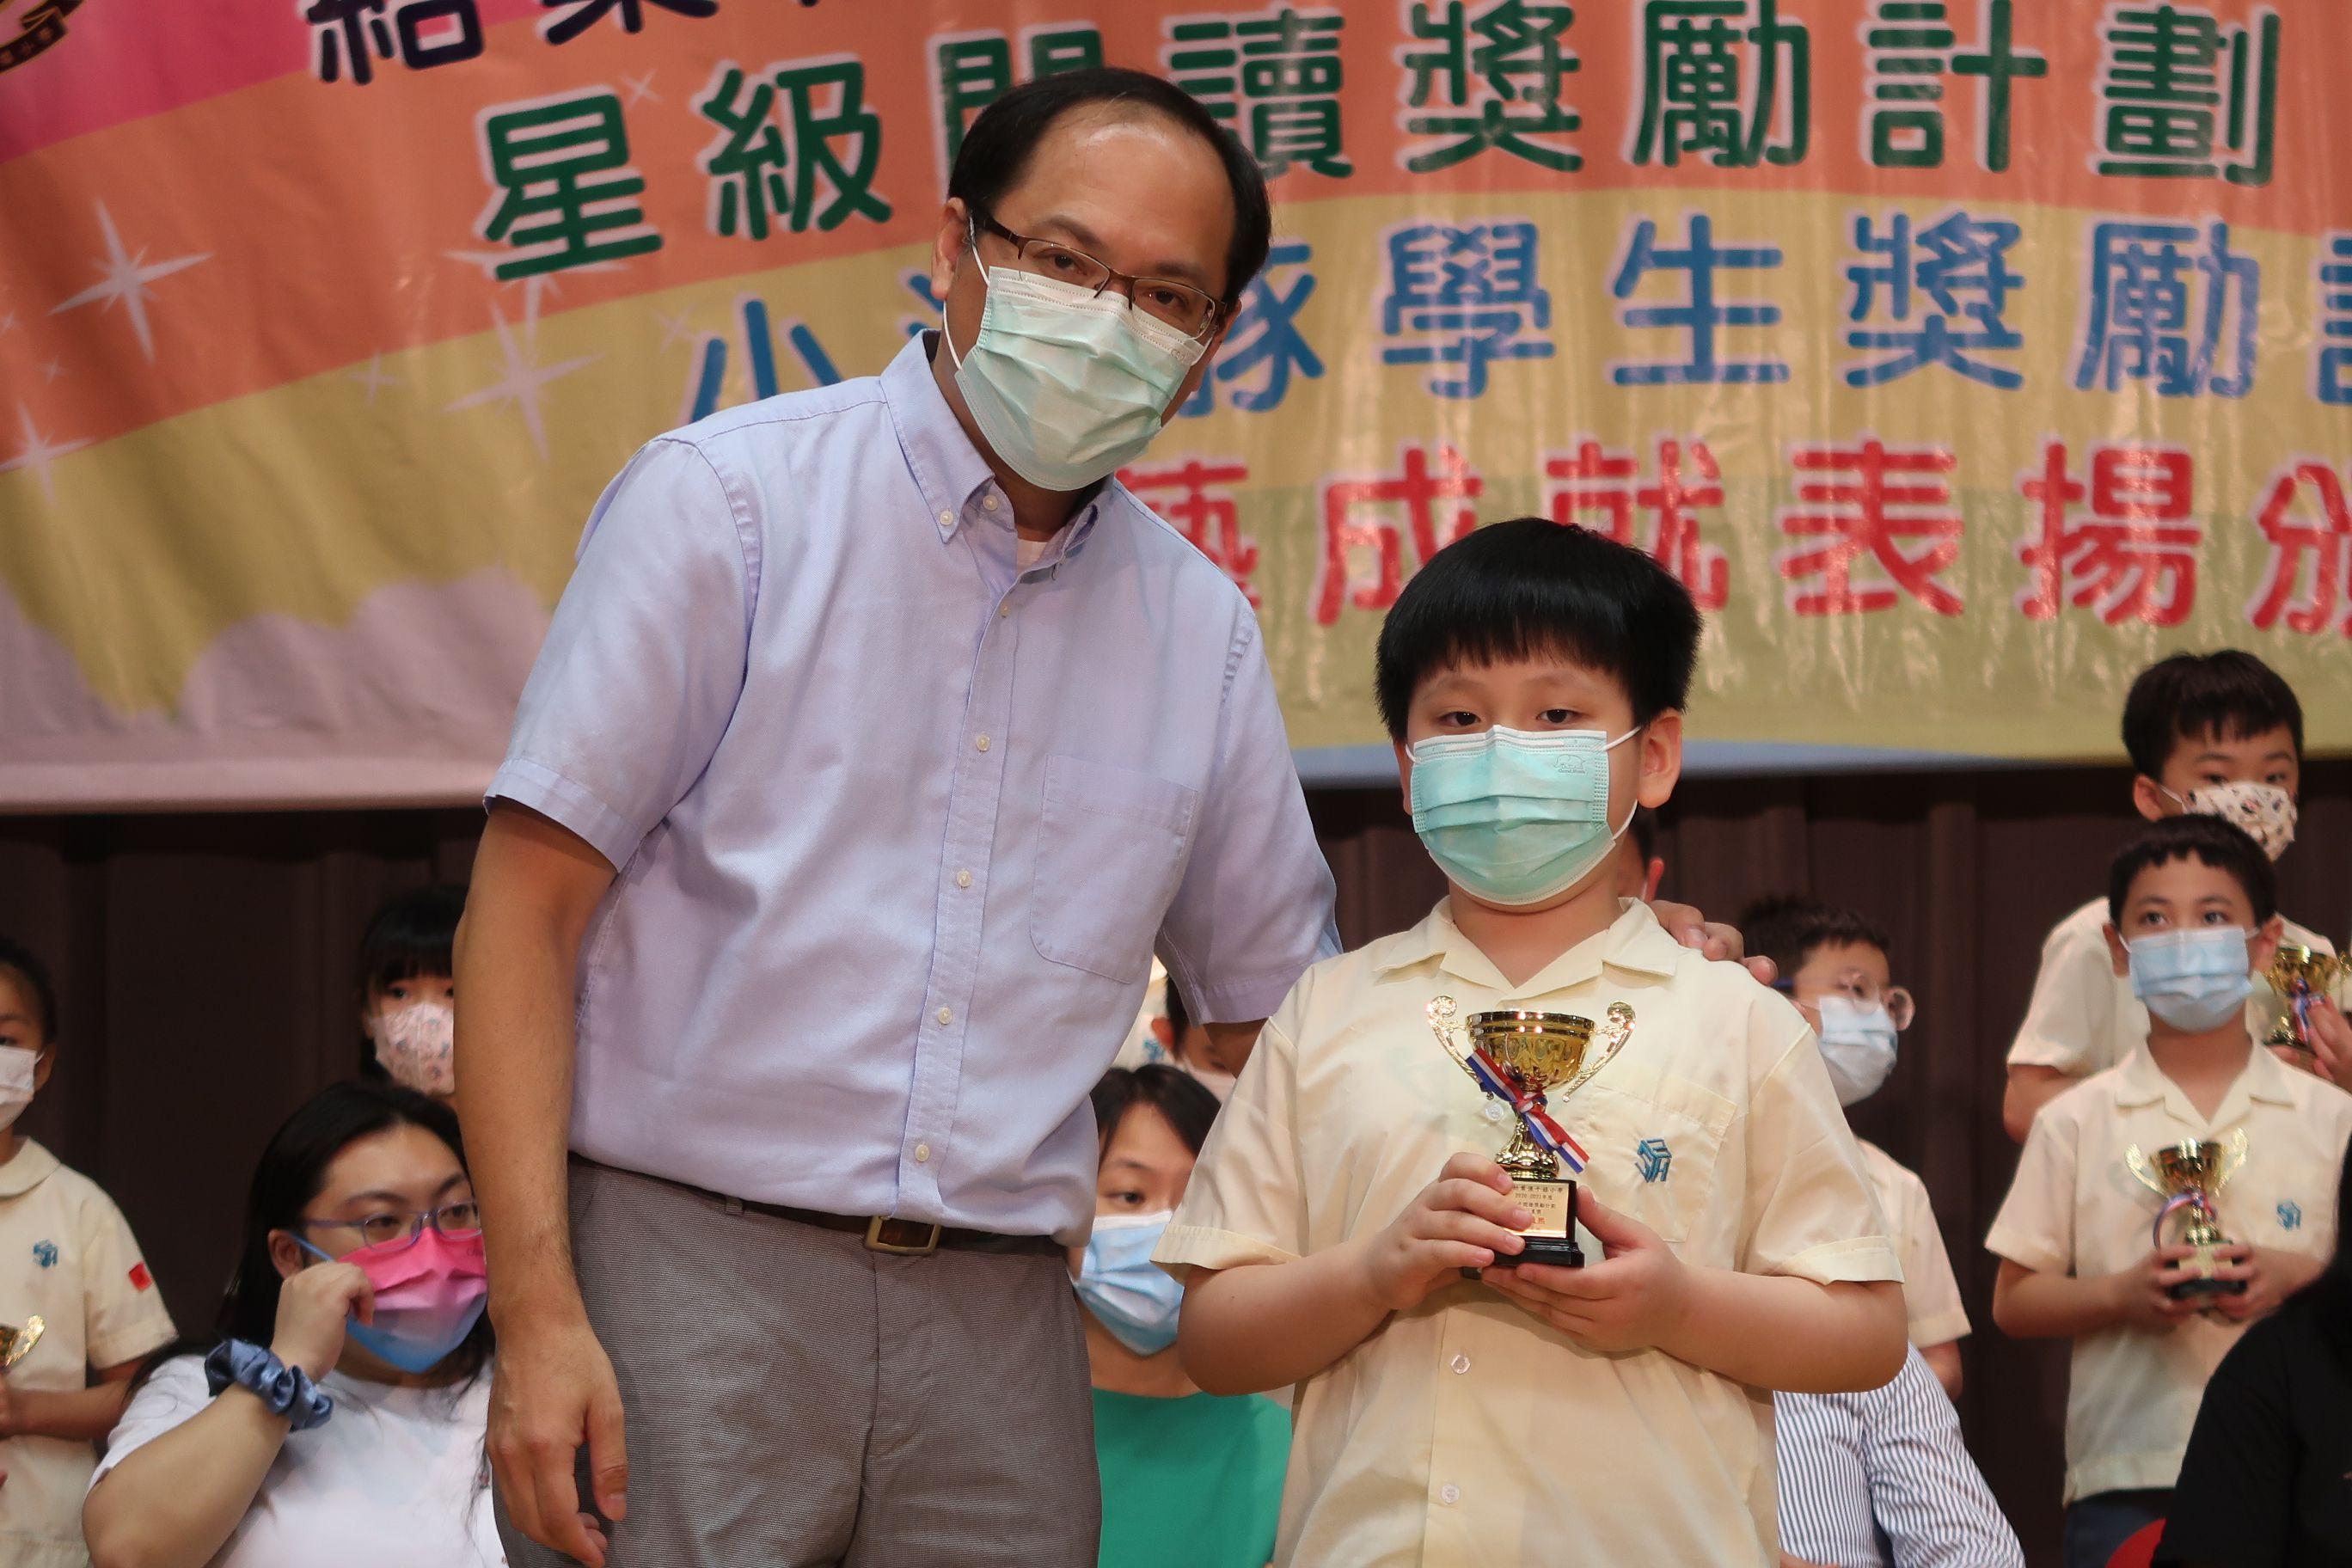 https://syh.edu.hk/sites/default/files/img_5809.jpg